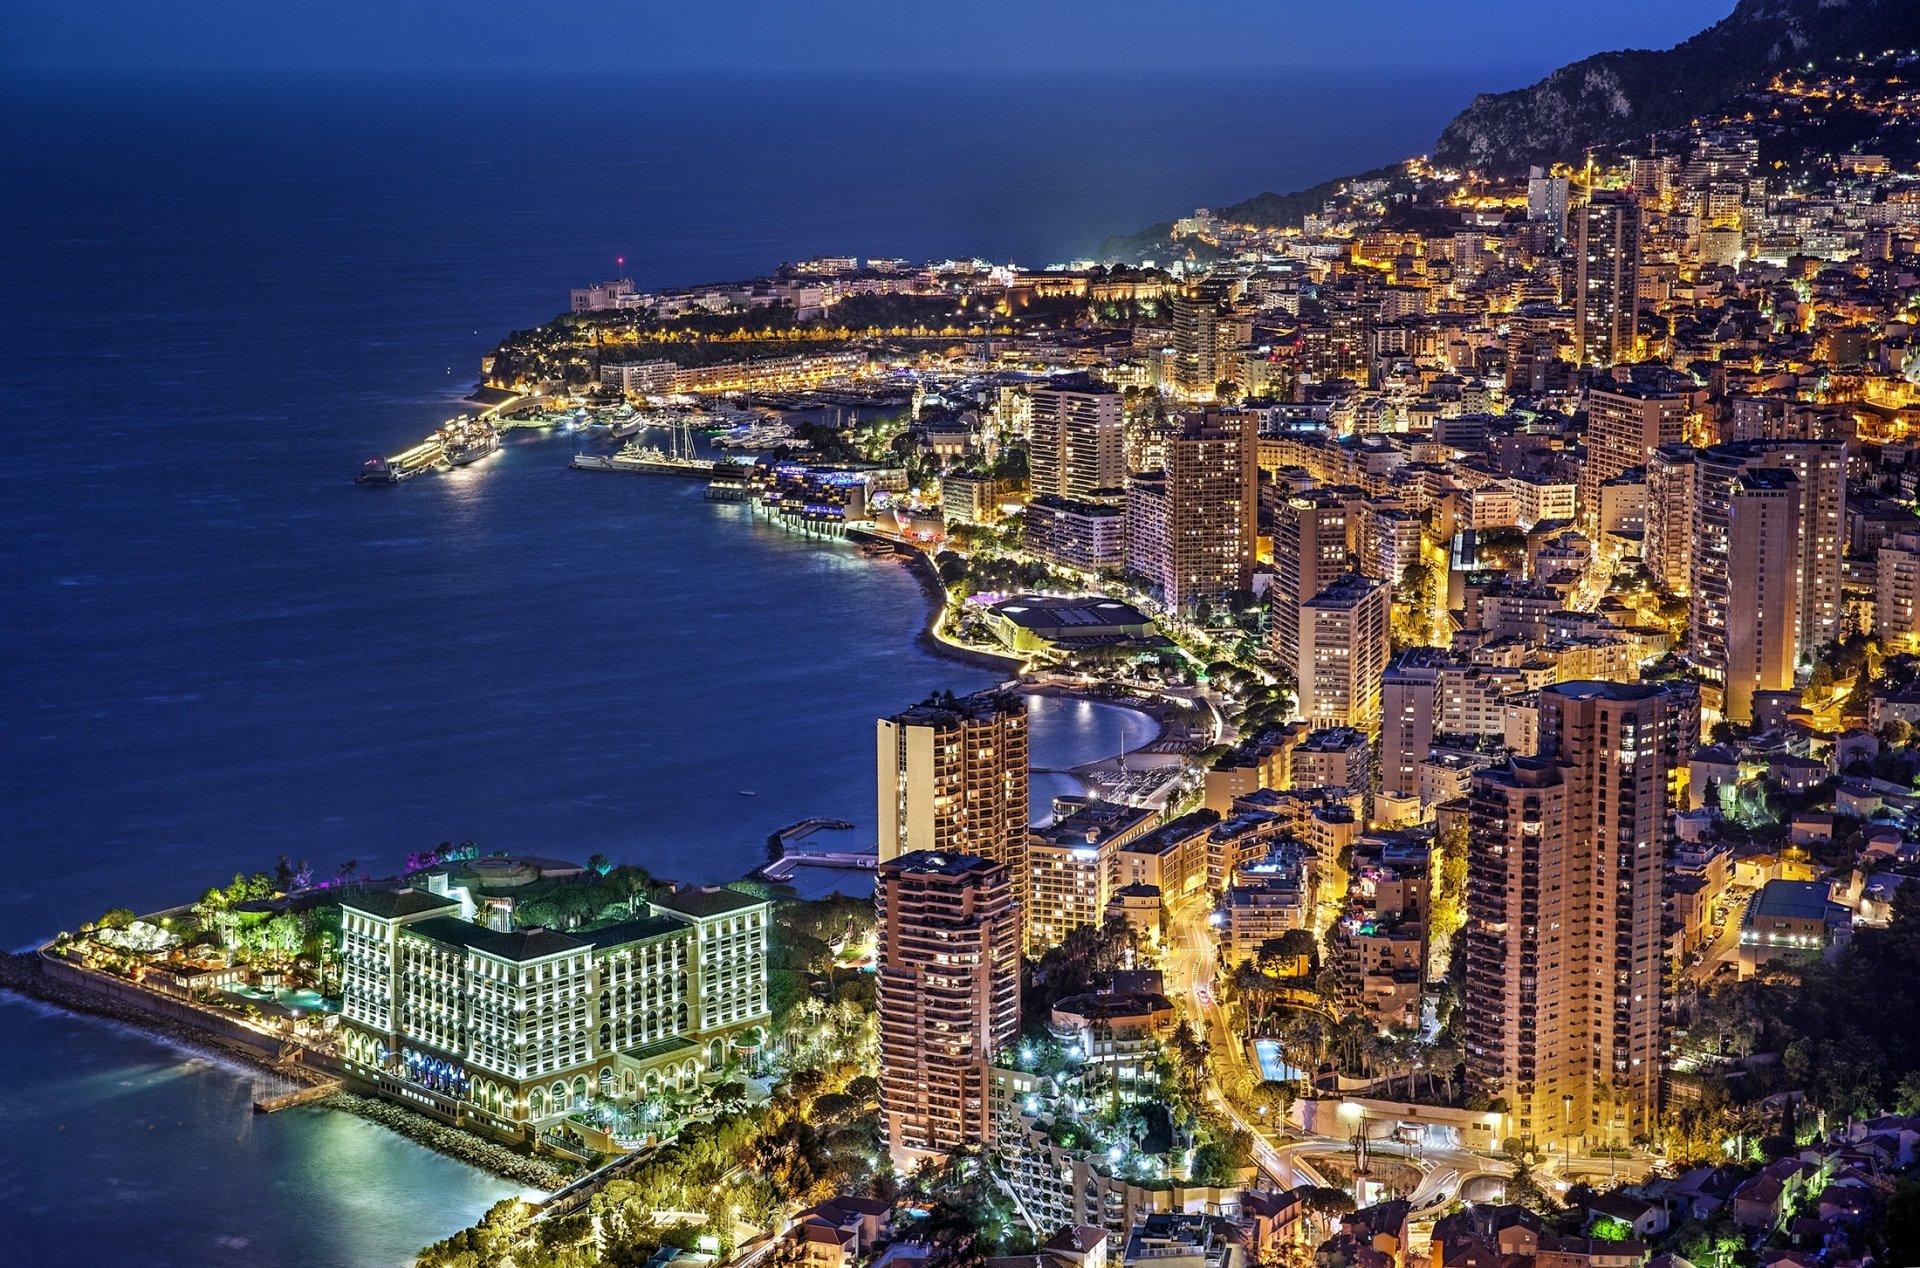 Man Made - Monaco  Light City Skyscraper Coastline Night Building Wallpaper